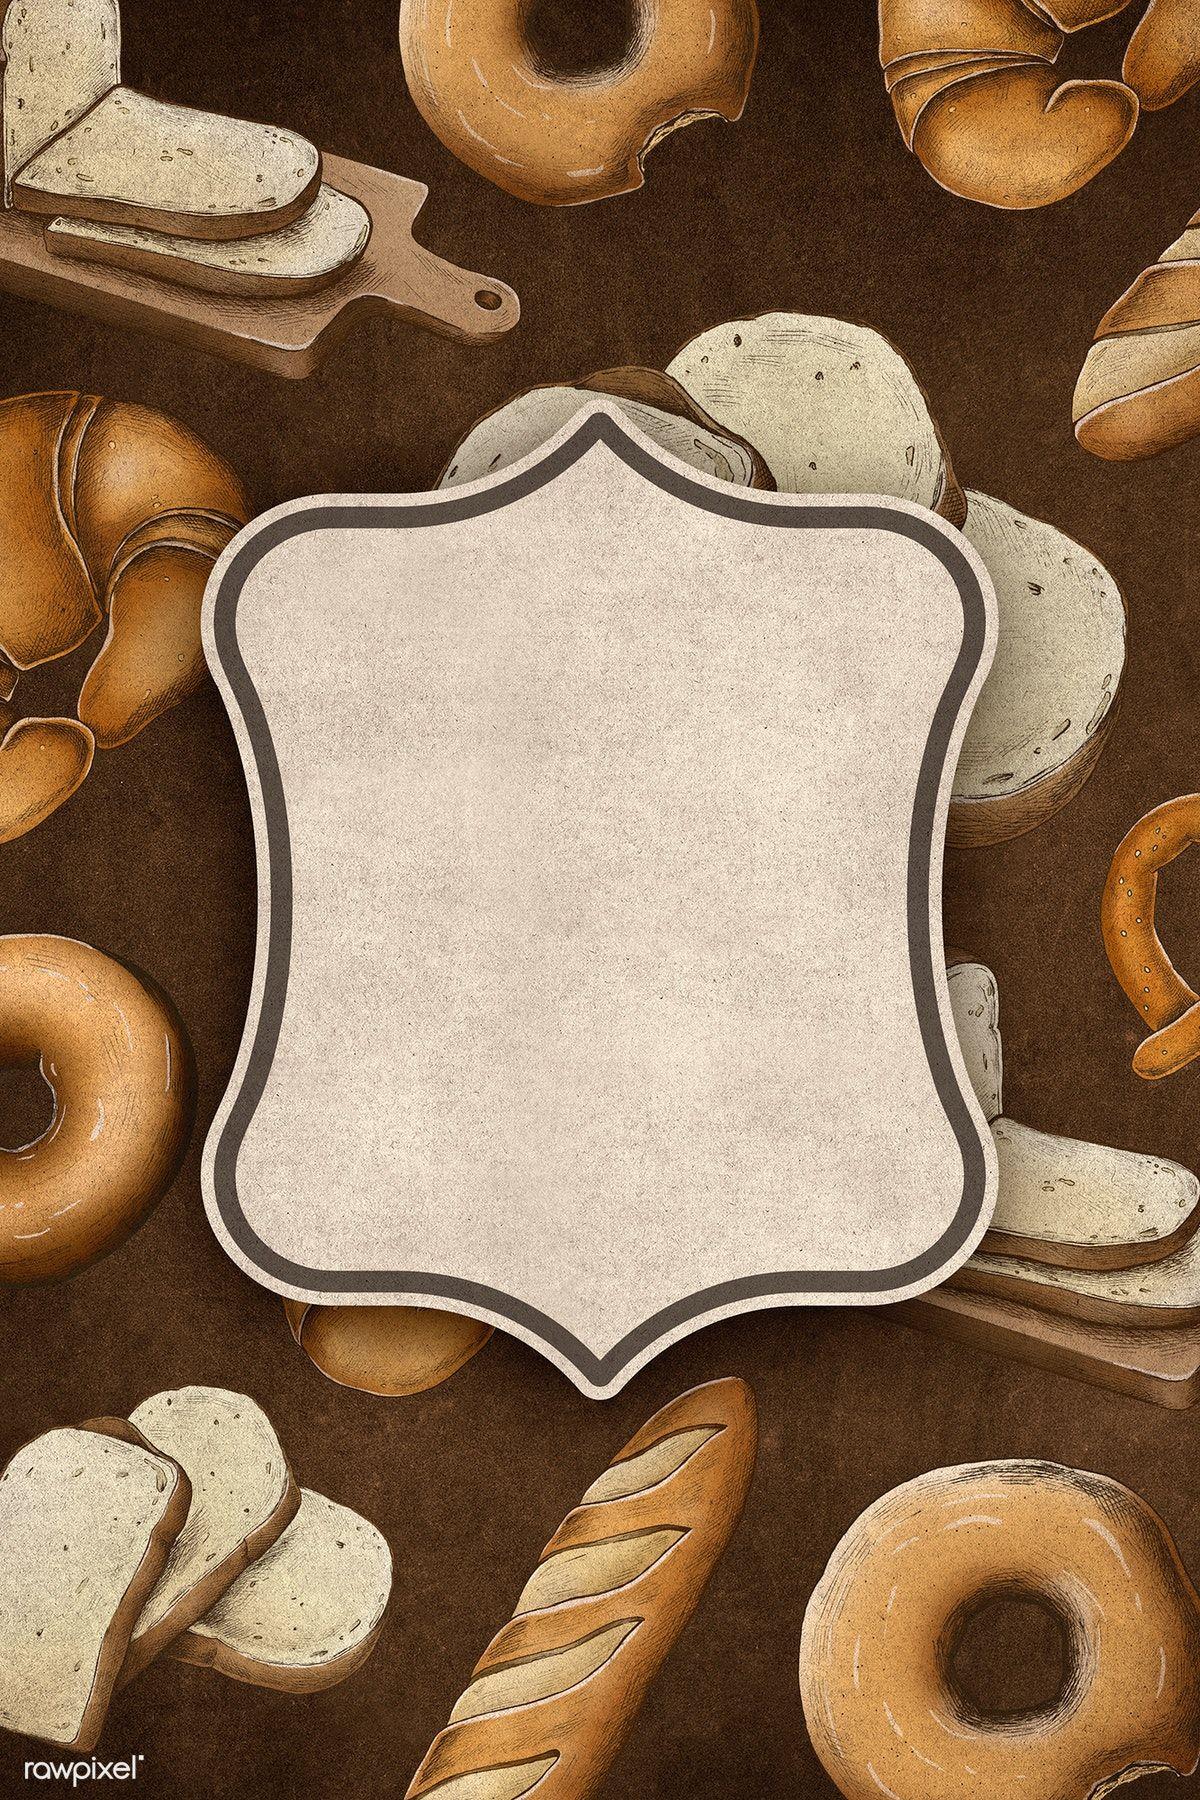 Hand Drawn Vintage Baked Bread Badge Premium Image By Rawpixel Com Vintage Baking Food Background Wallpapers Baking Wallpaper